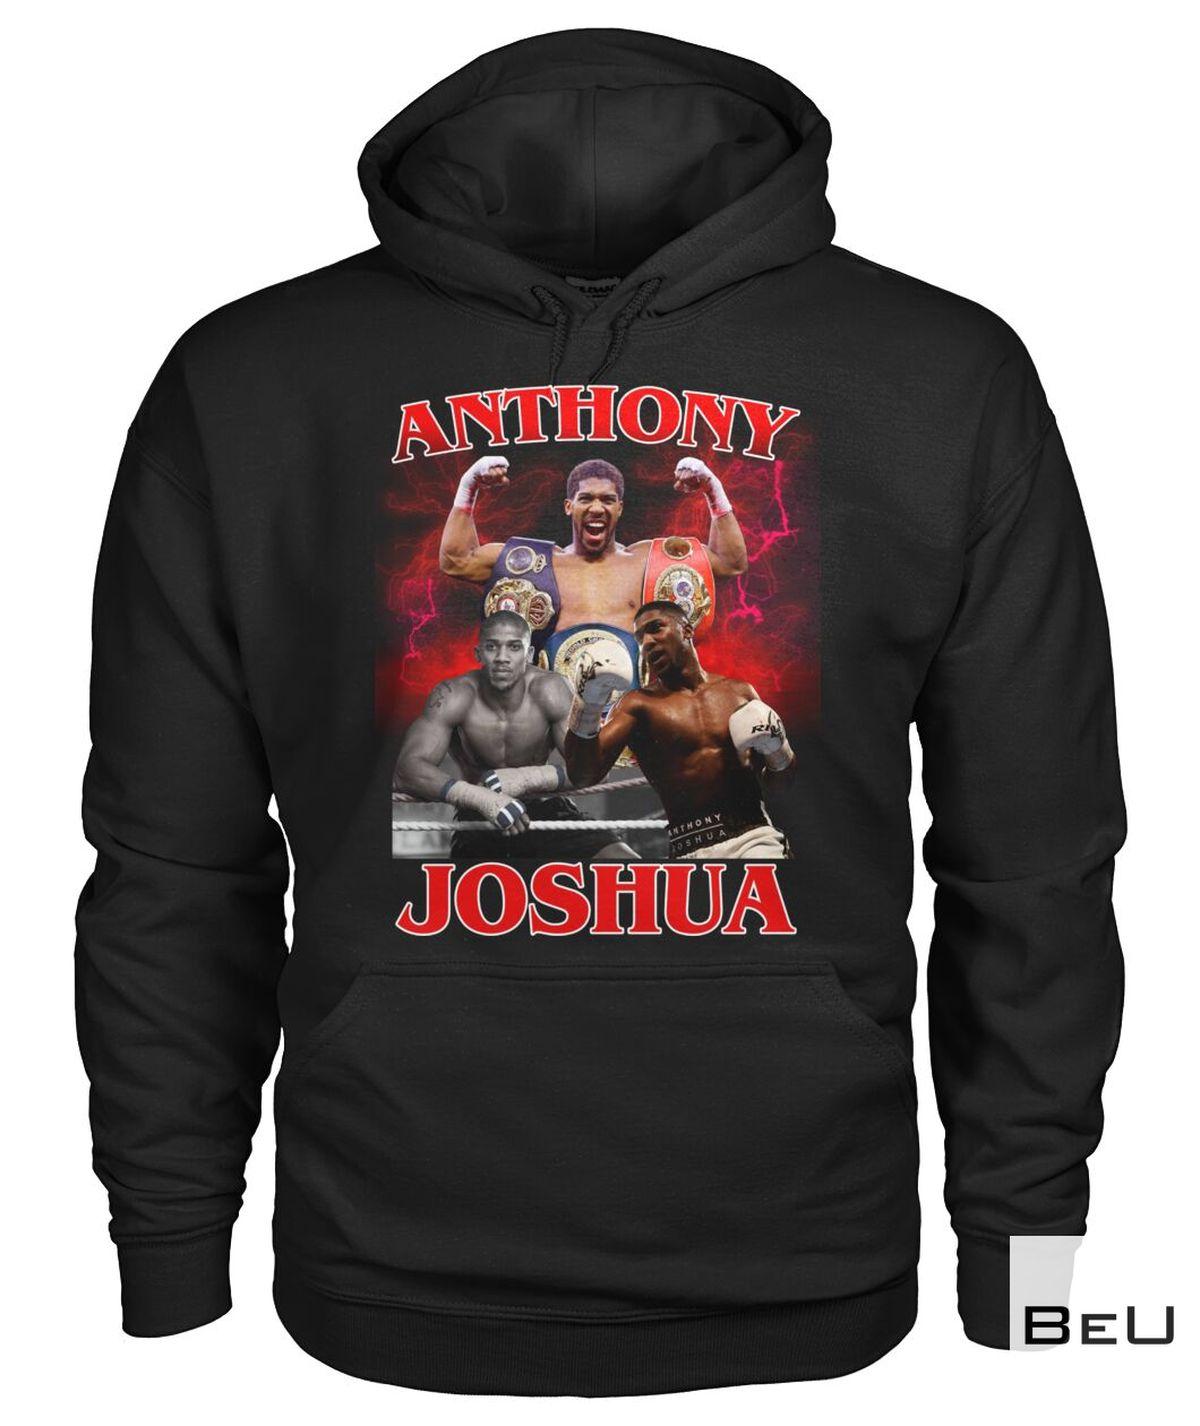 Print On Demand Anthony Joshua Champion Shirt